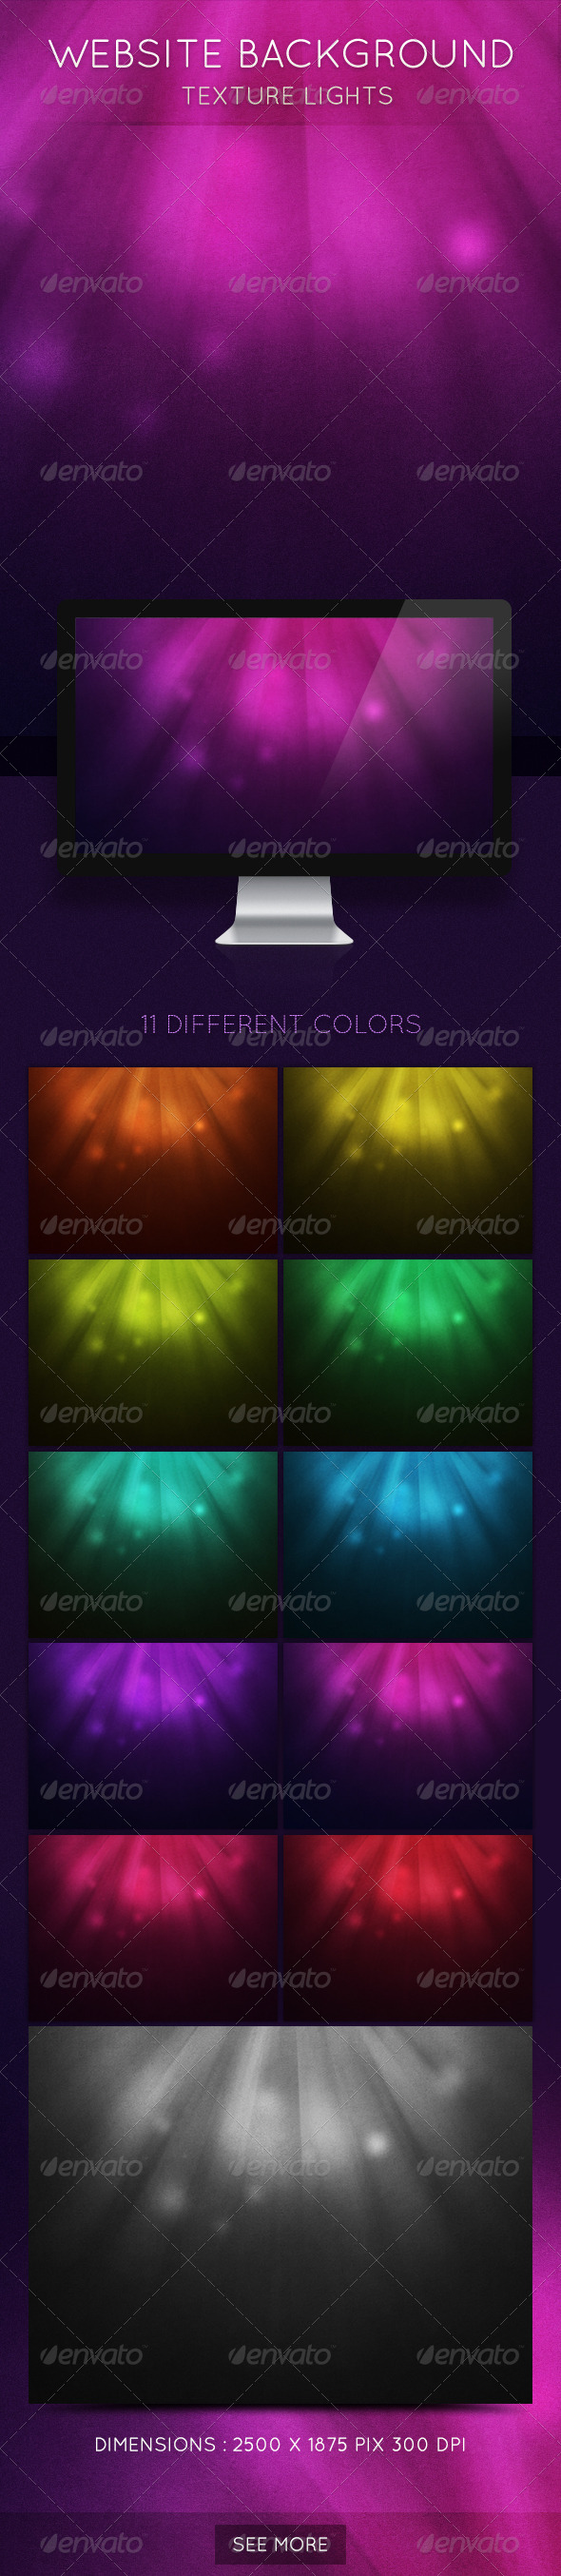 Website Background Texture Lights